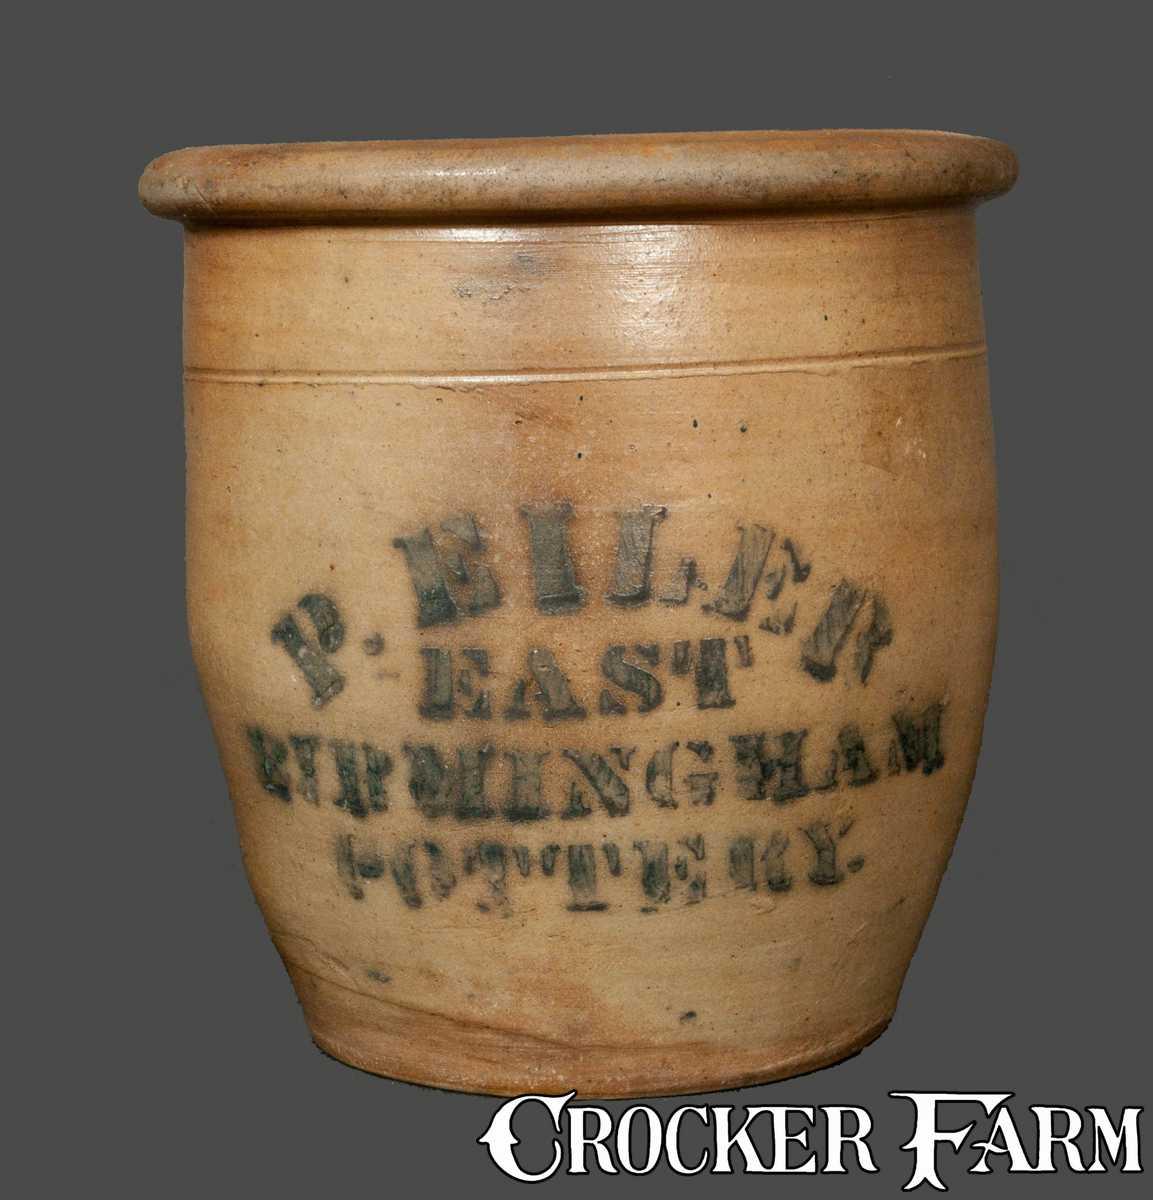 P Eiler East Birmingham Pottery Stoneware Cream Jar